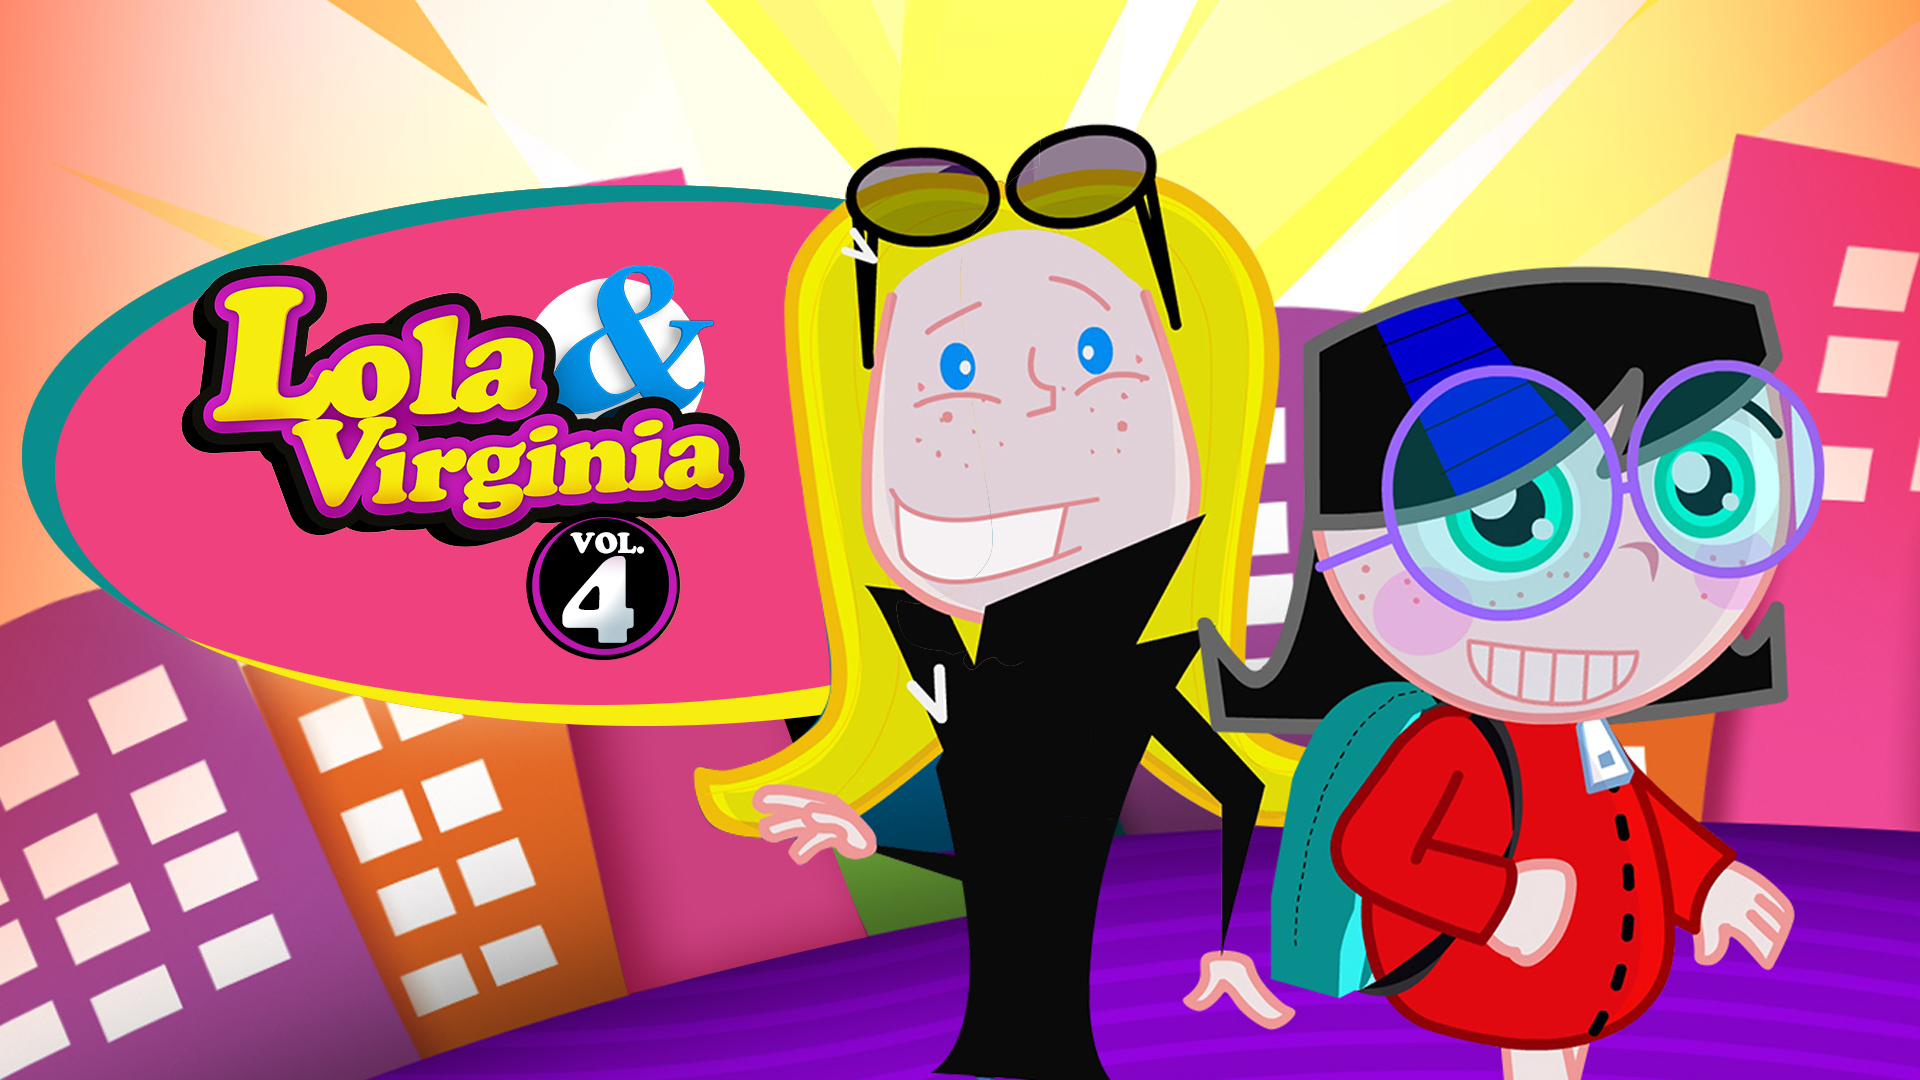 Lola & Virginia (volume 4)